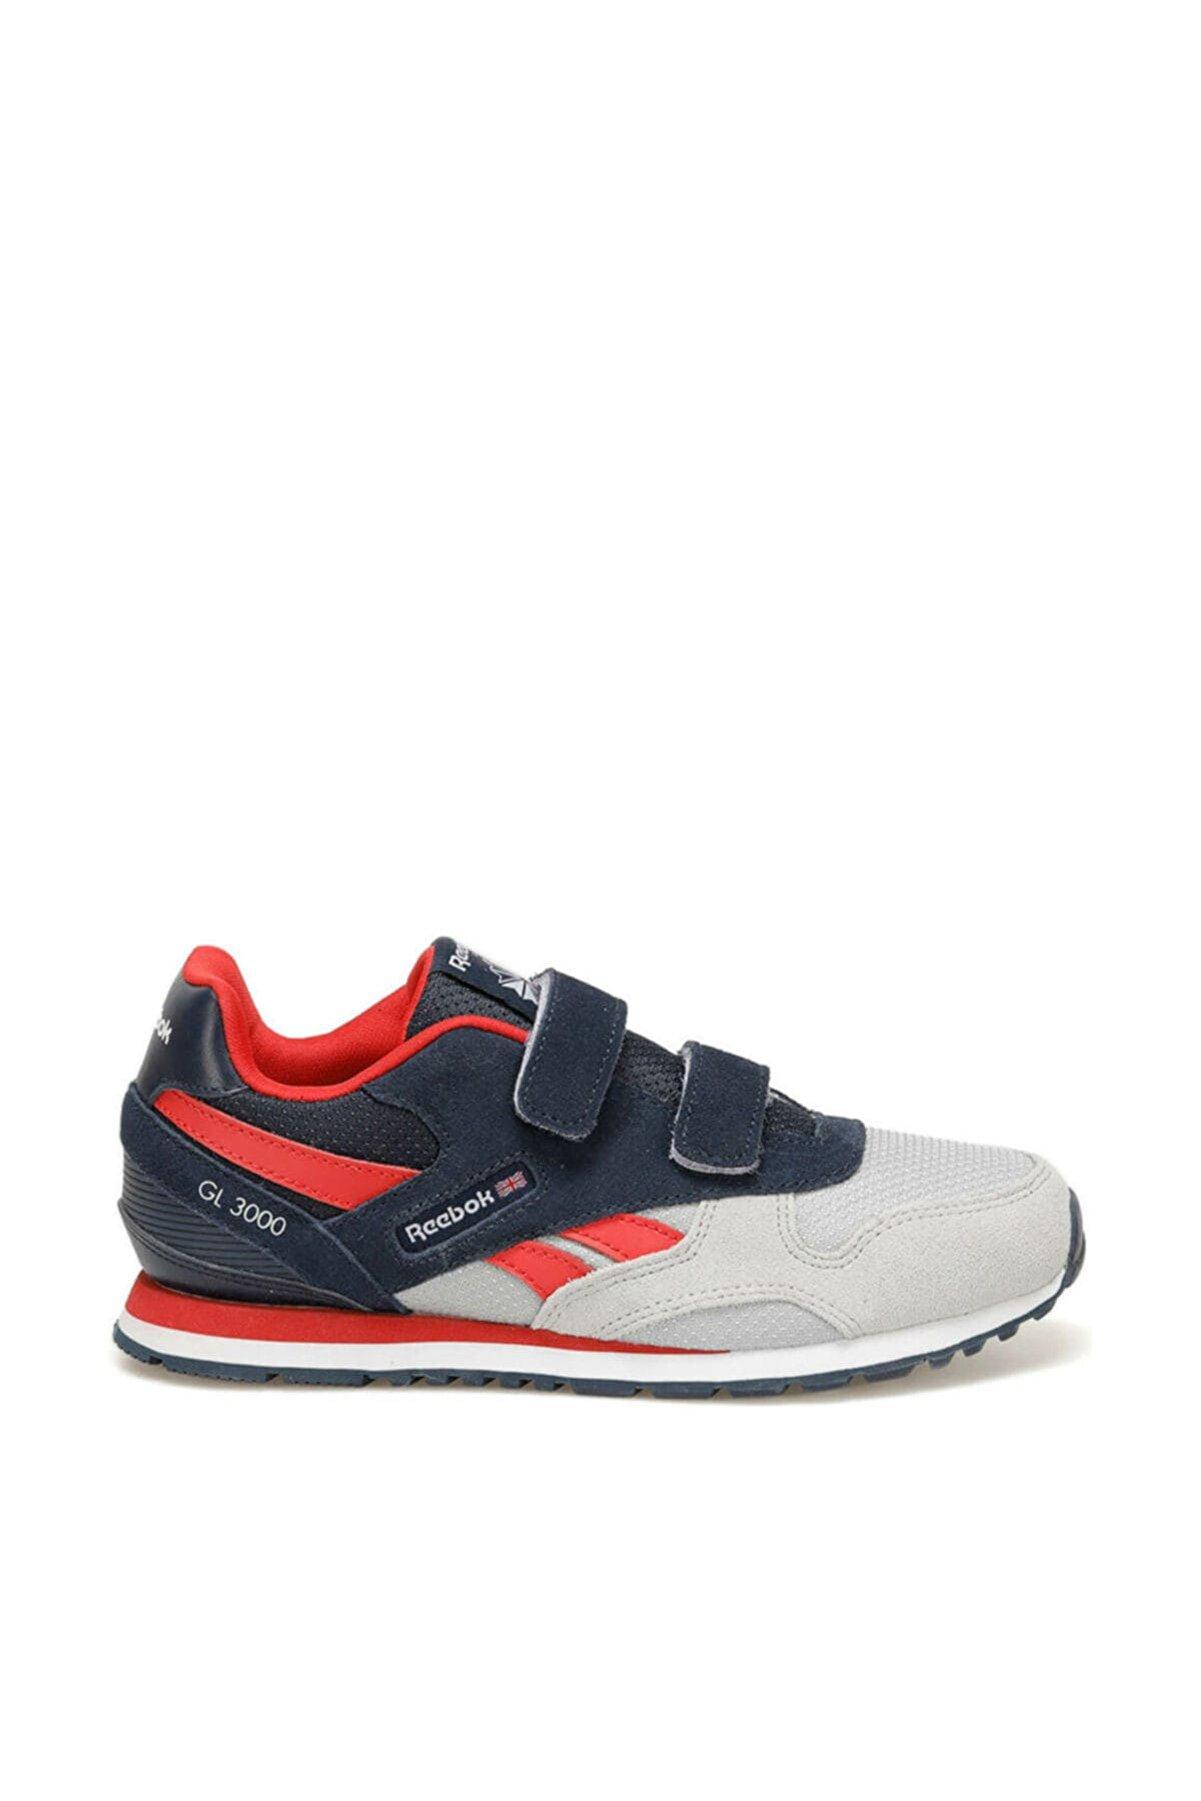 adidas Pembe Çocuk Ayakkabı 100260390